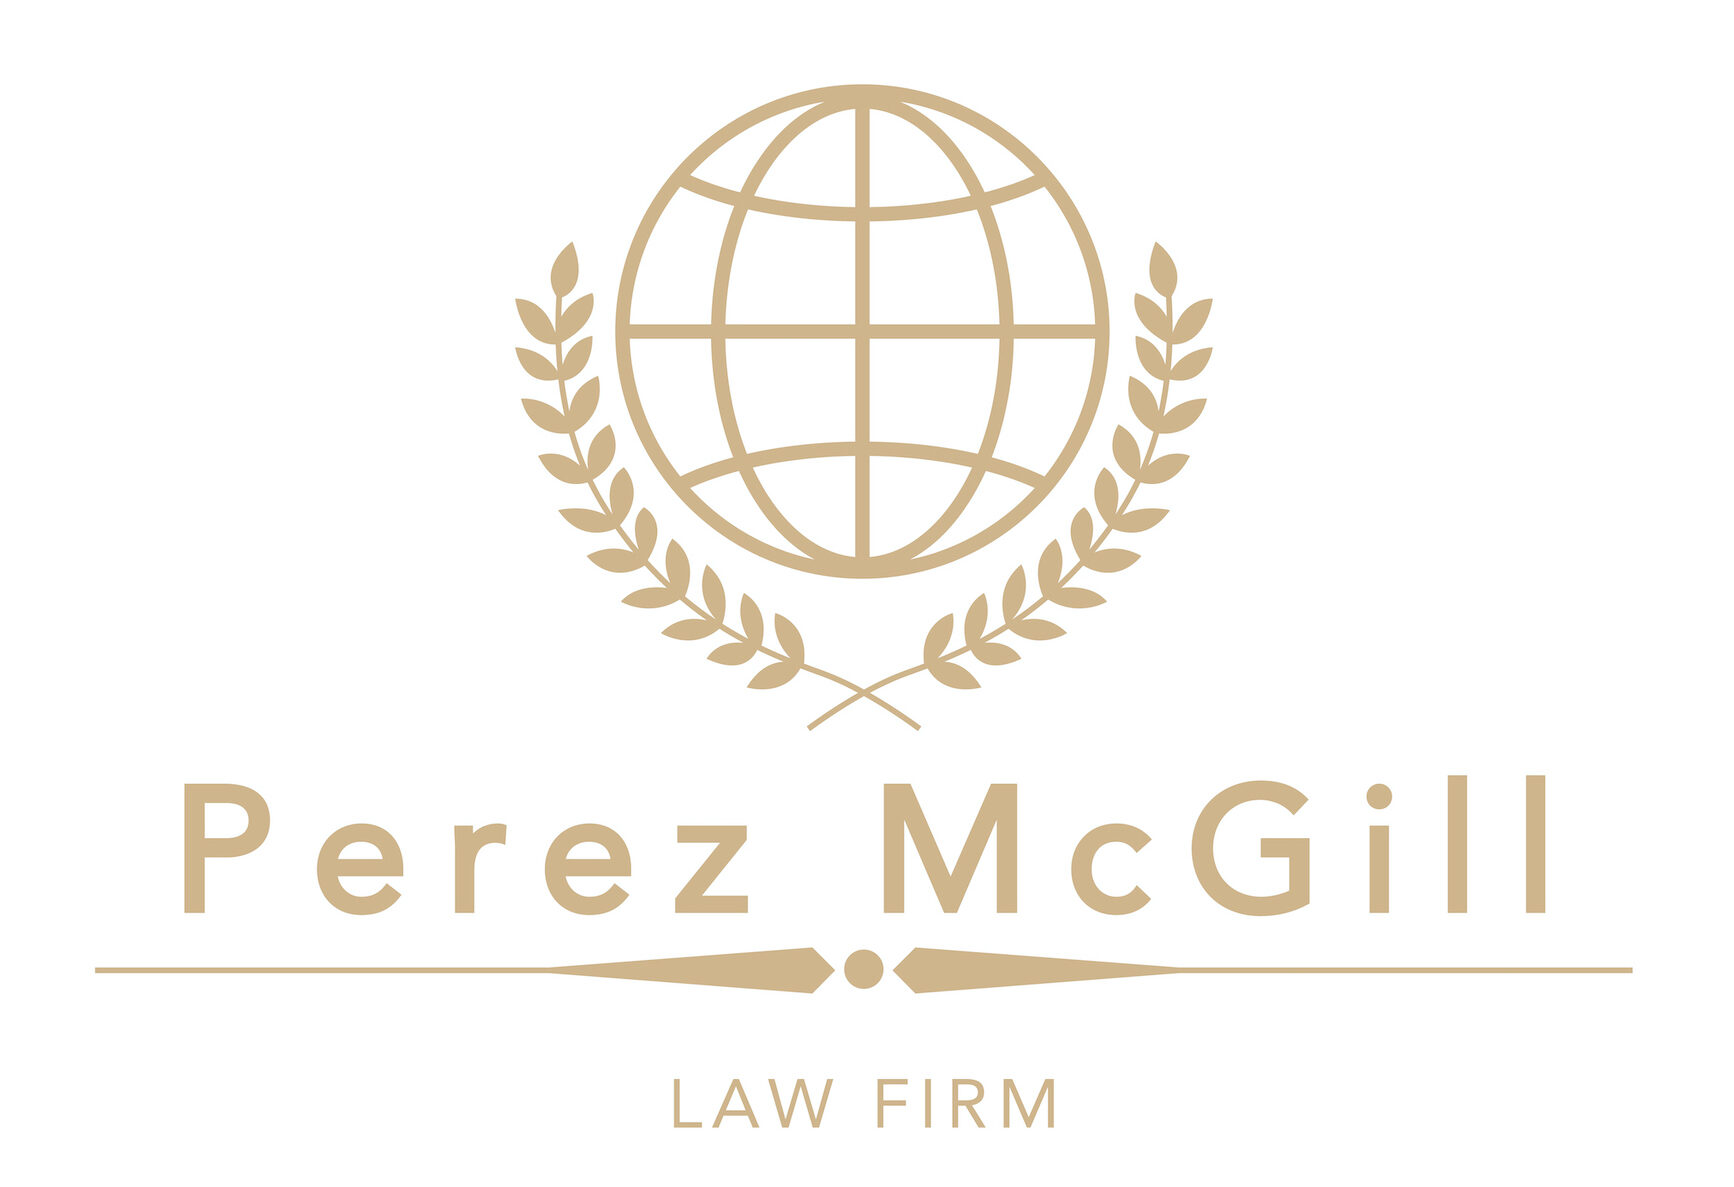 Perez McGill Law